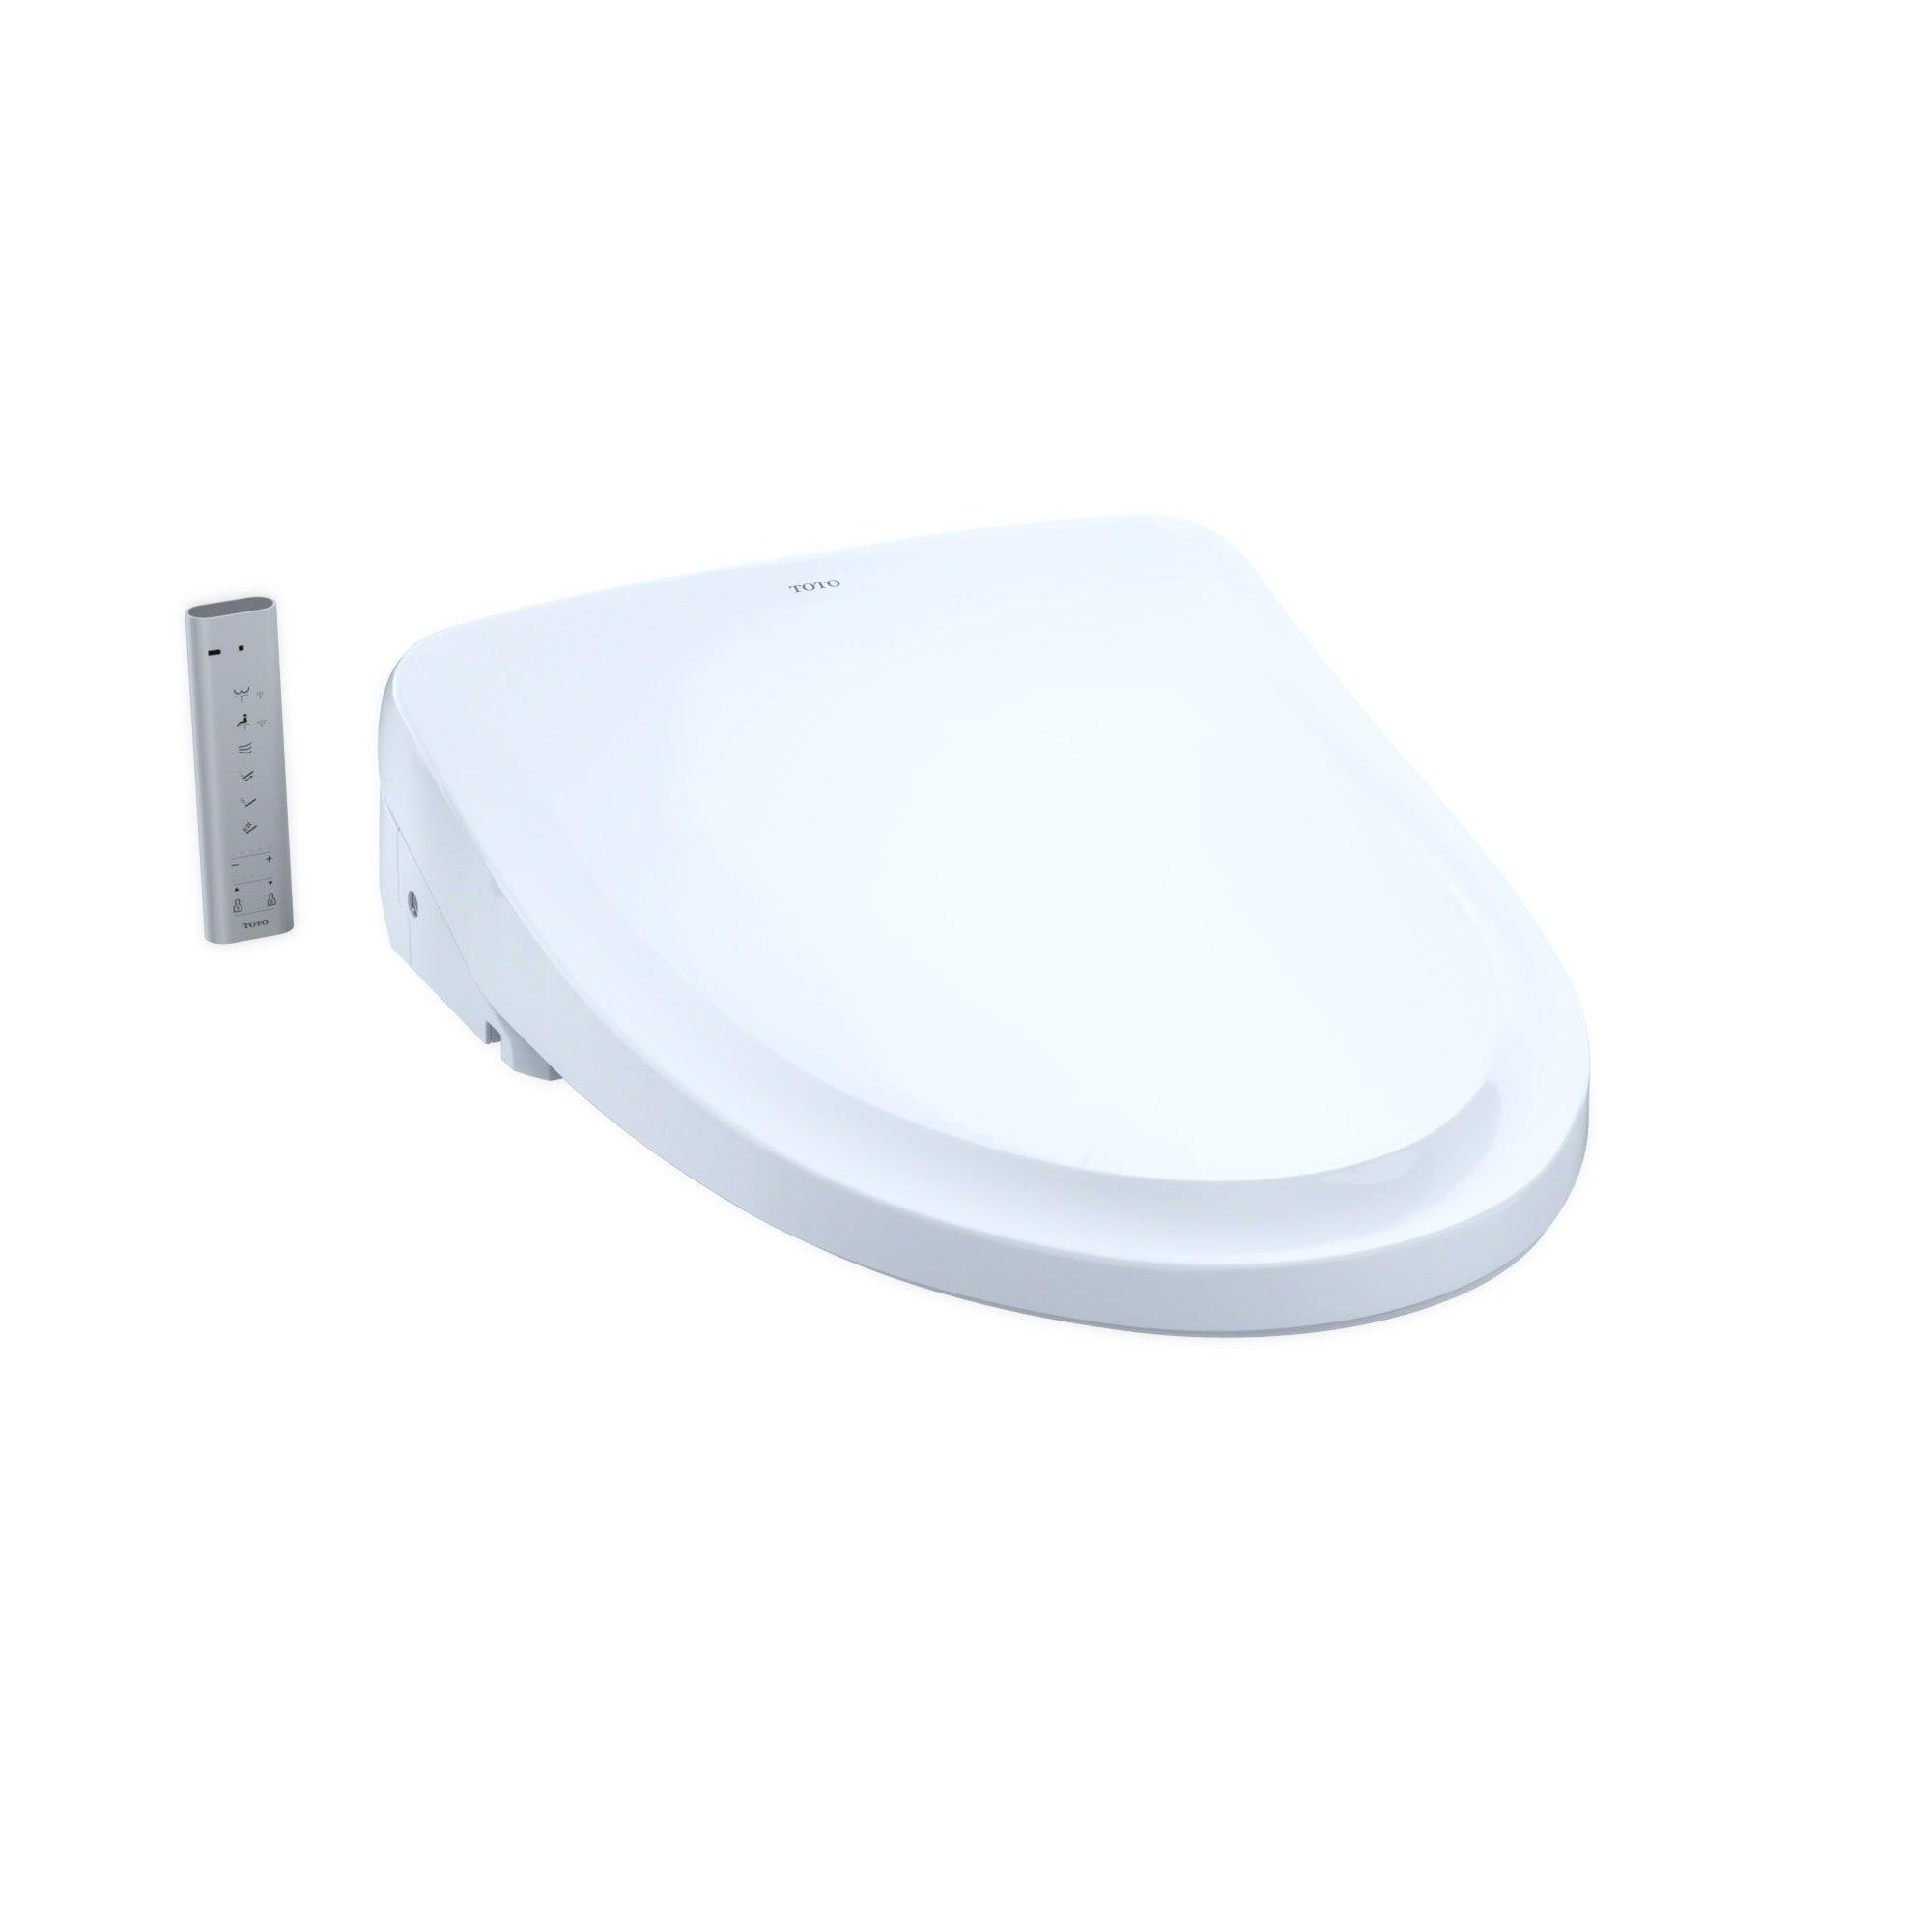 TOTO Sw3044 Washlet S500e Elongated Bidet Toilet Seat With Ewater ...